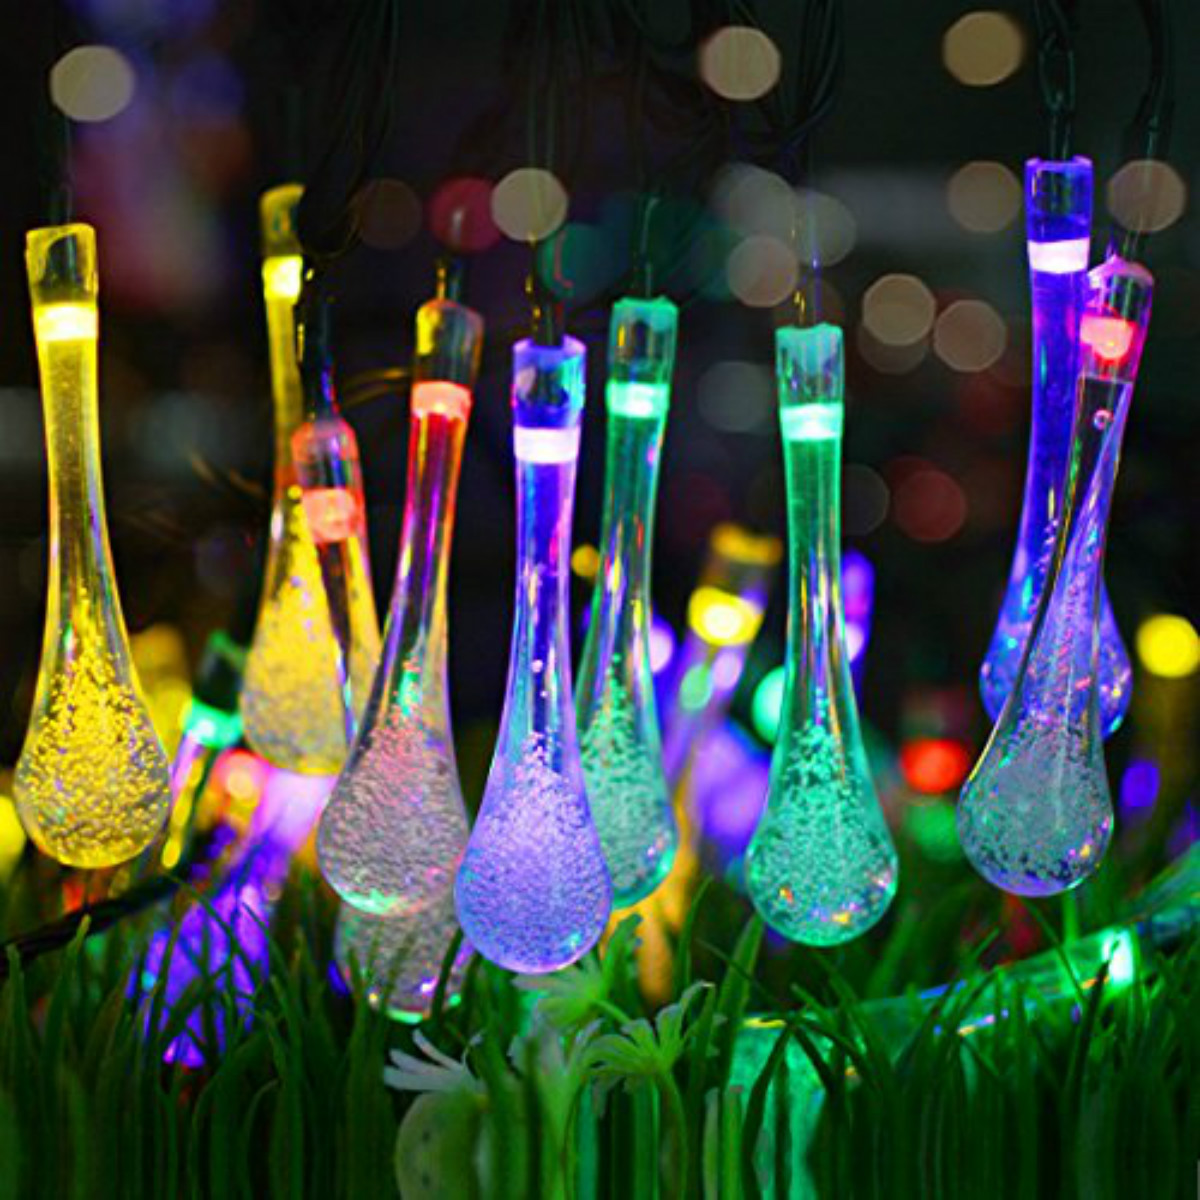 IOW Descuento LEDs, Natural